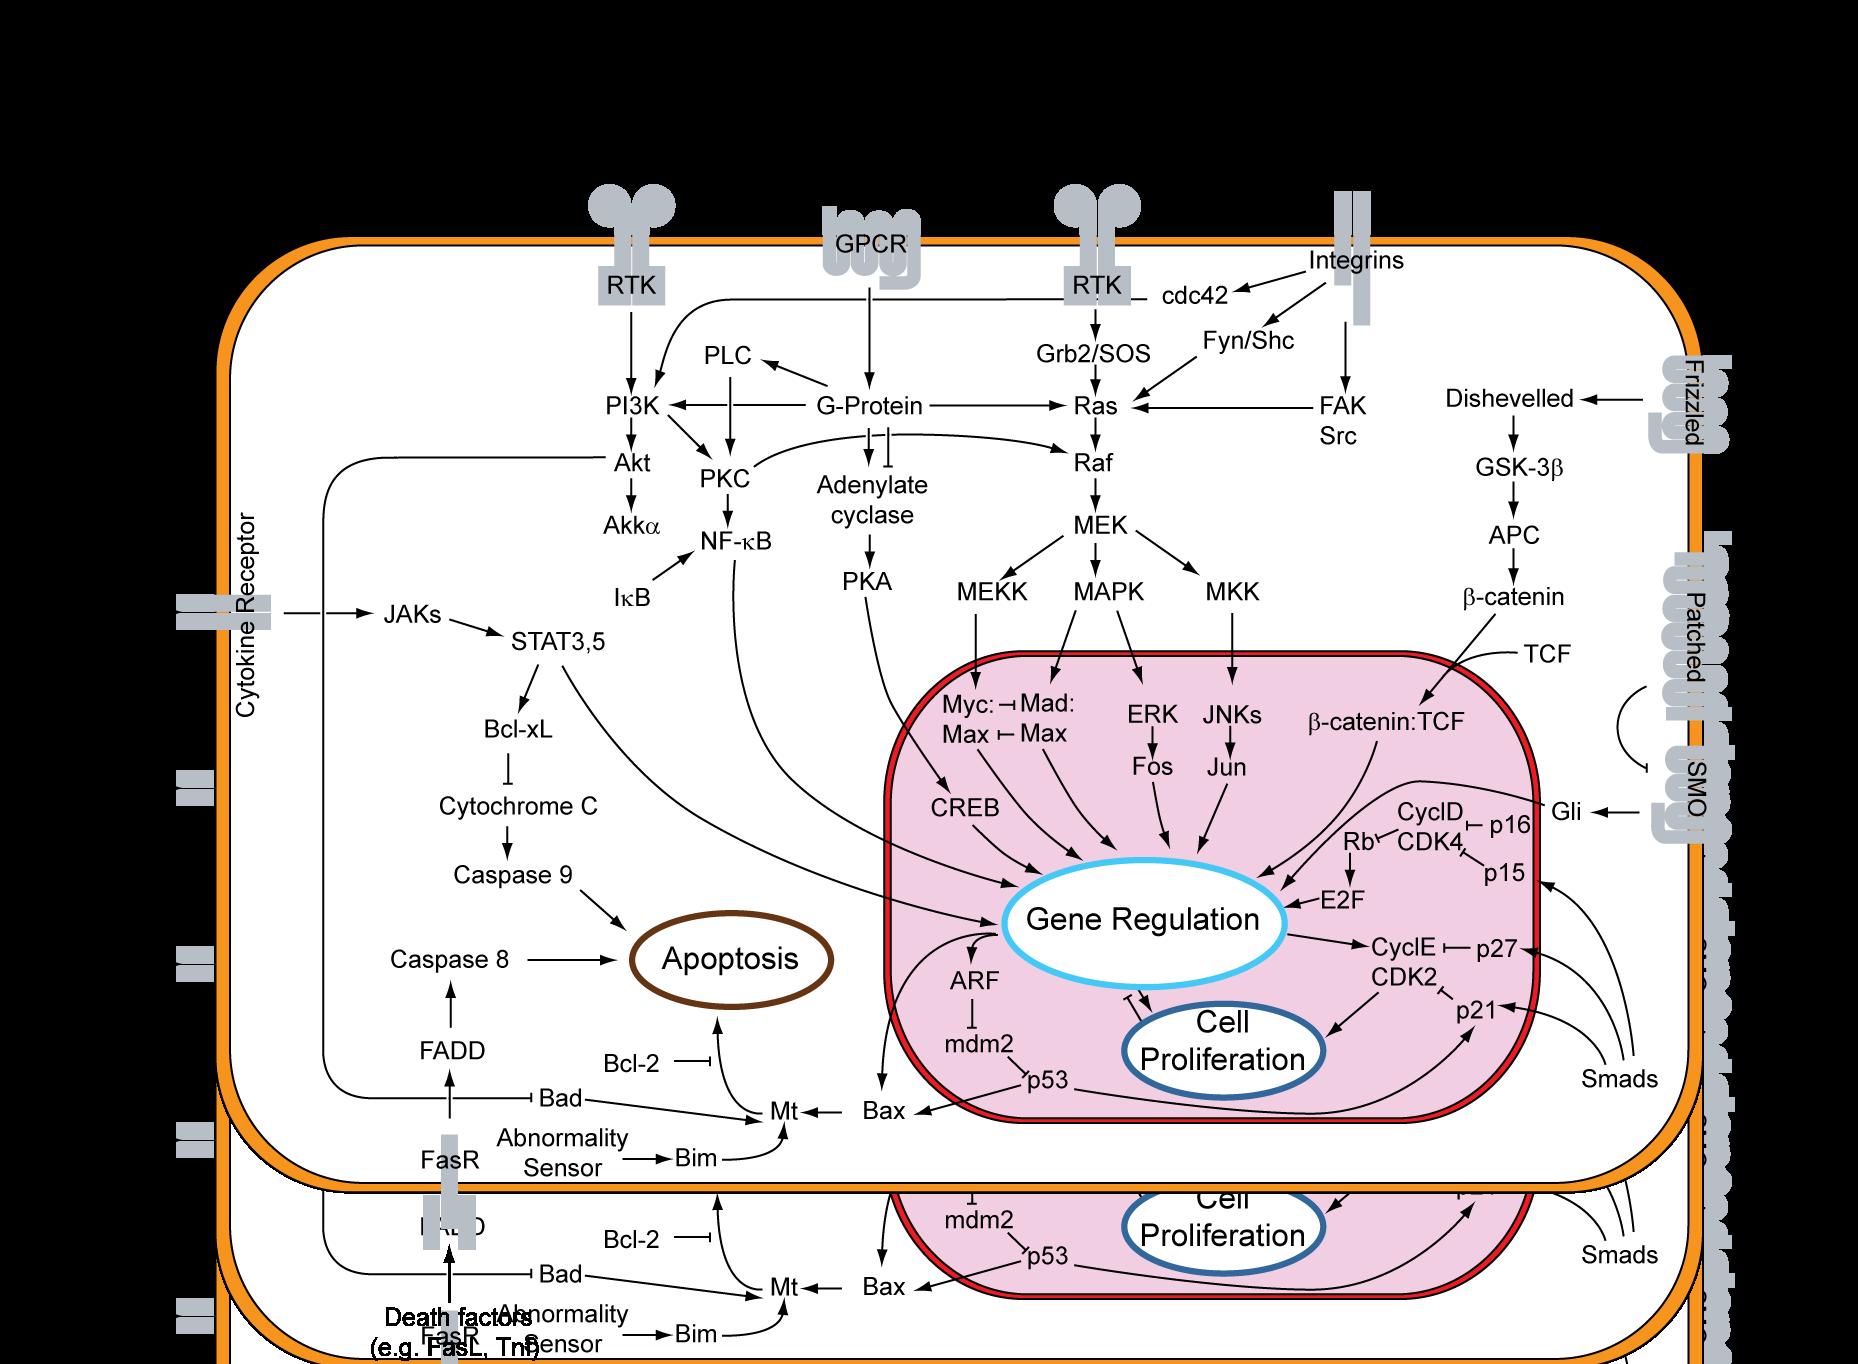 Mitogen-activated protein kinase